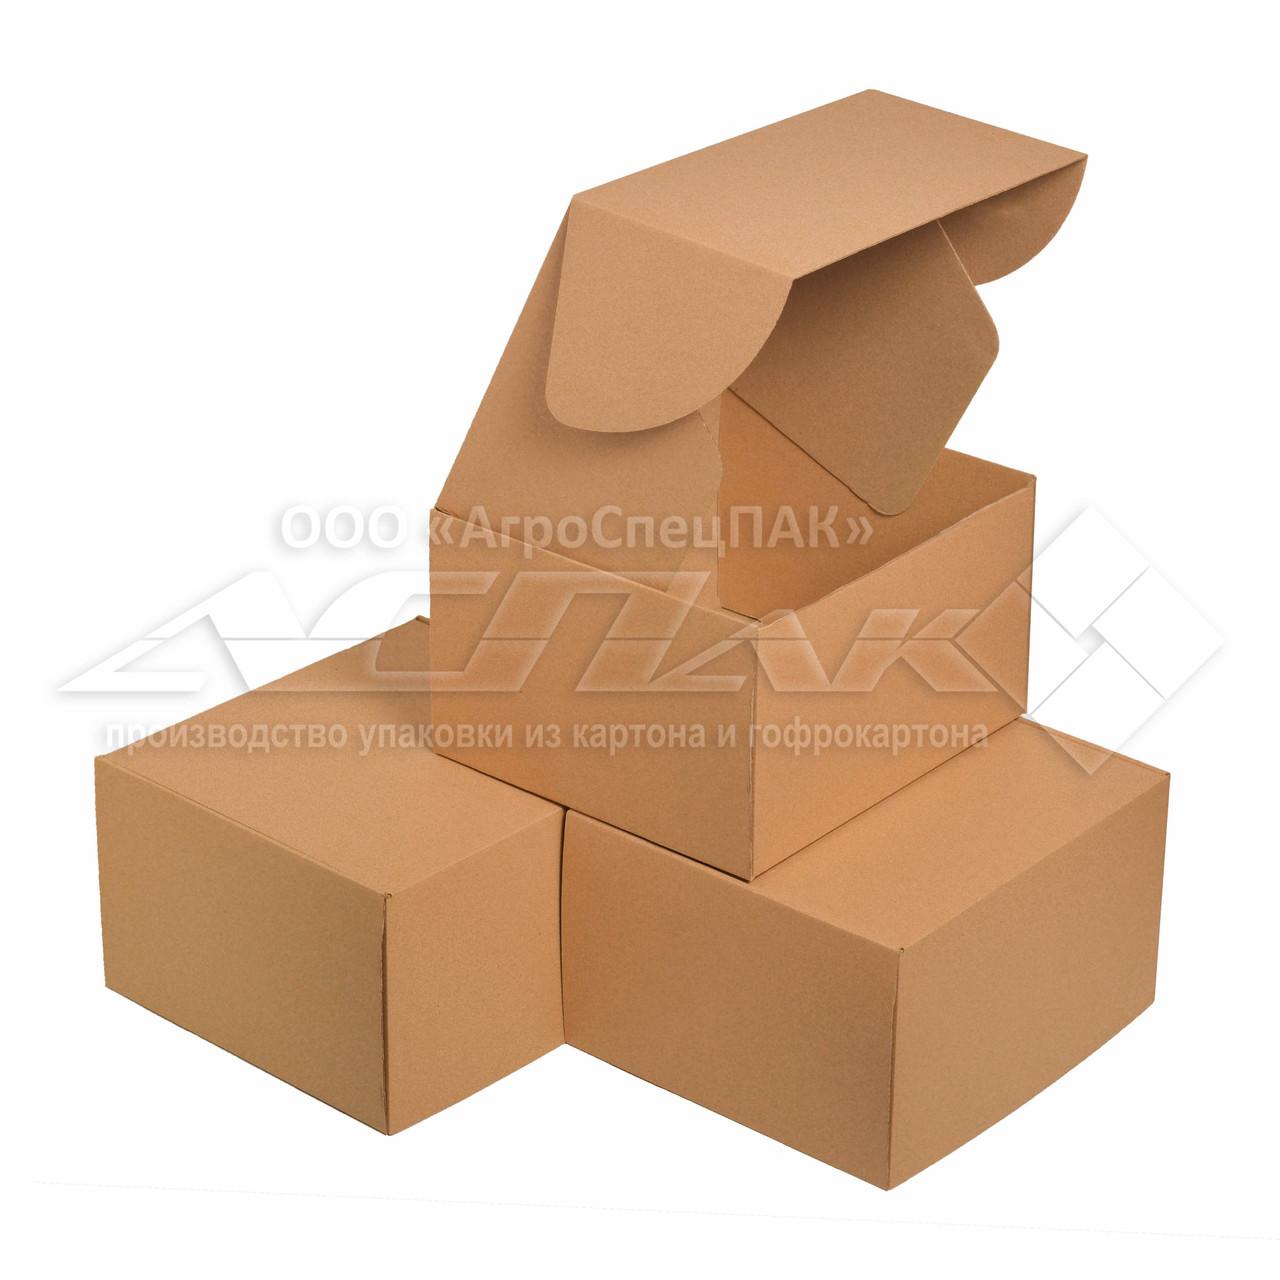 Упаковочные коробки 320x290x190 бурые. Крафтовые коробки.